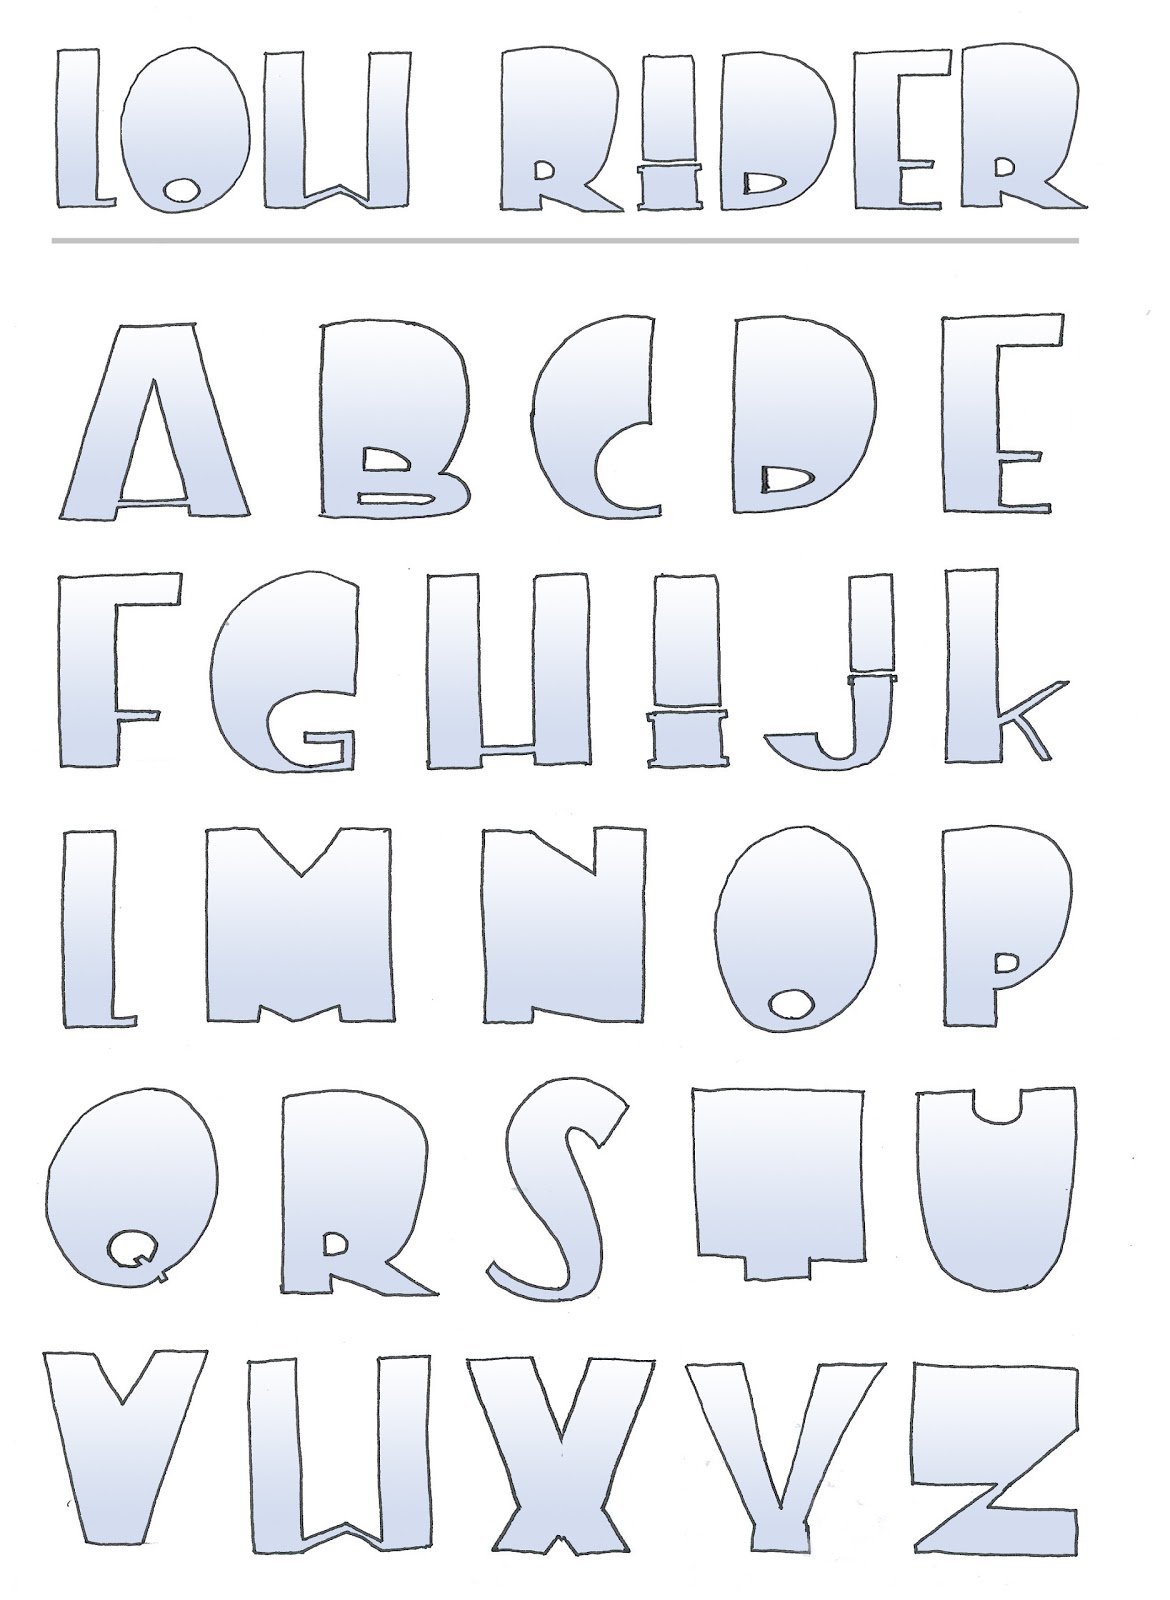 Downtown Doodler's Doodles: Colored Fonts